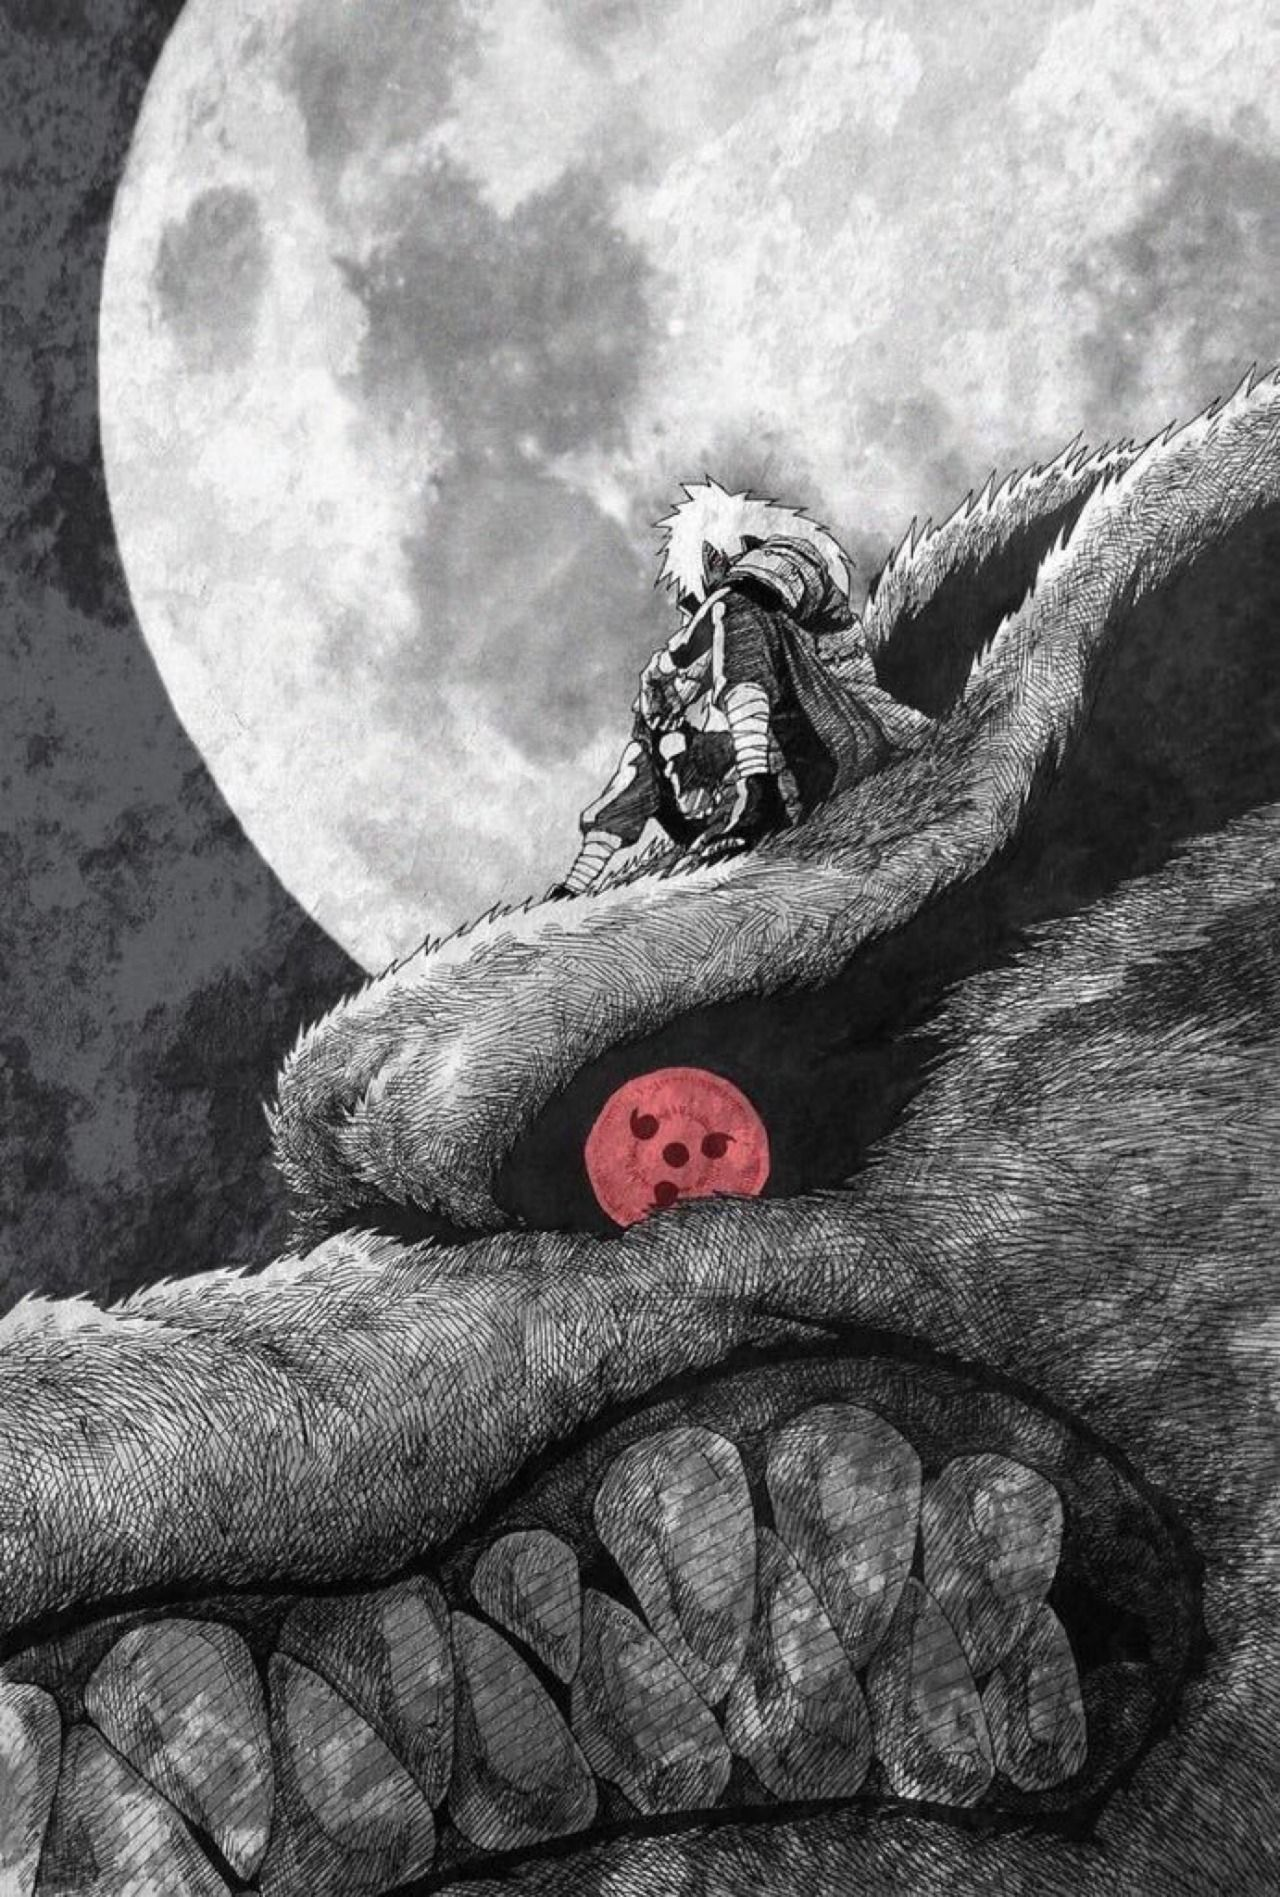 Fragile Madara uchiha, Naruto shippuden anime